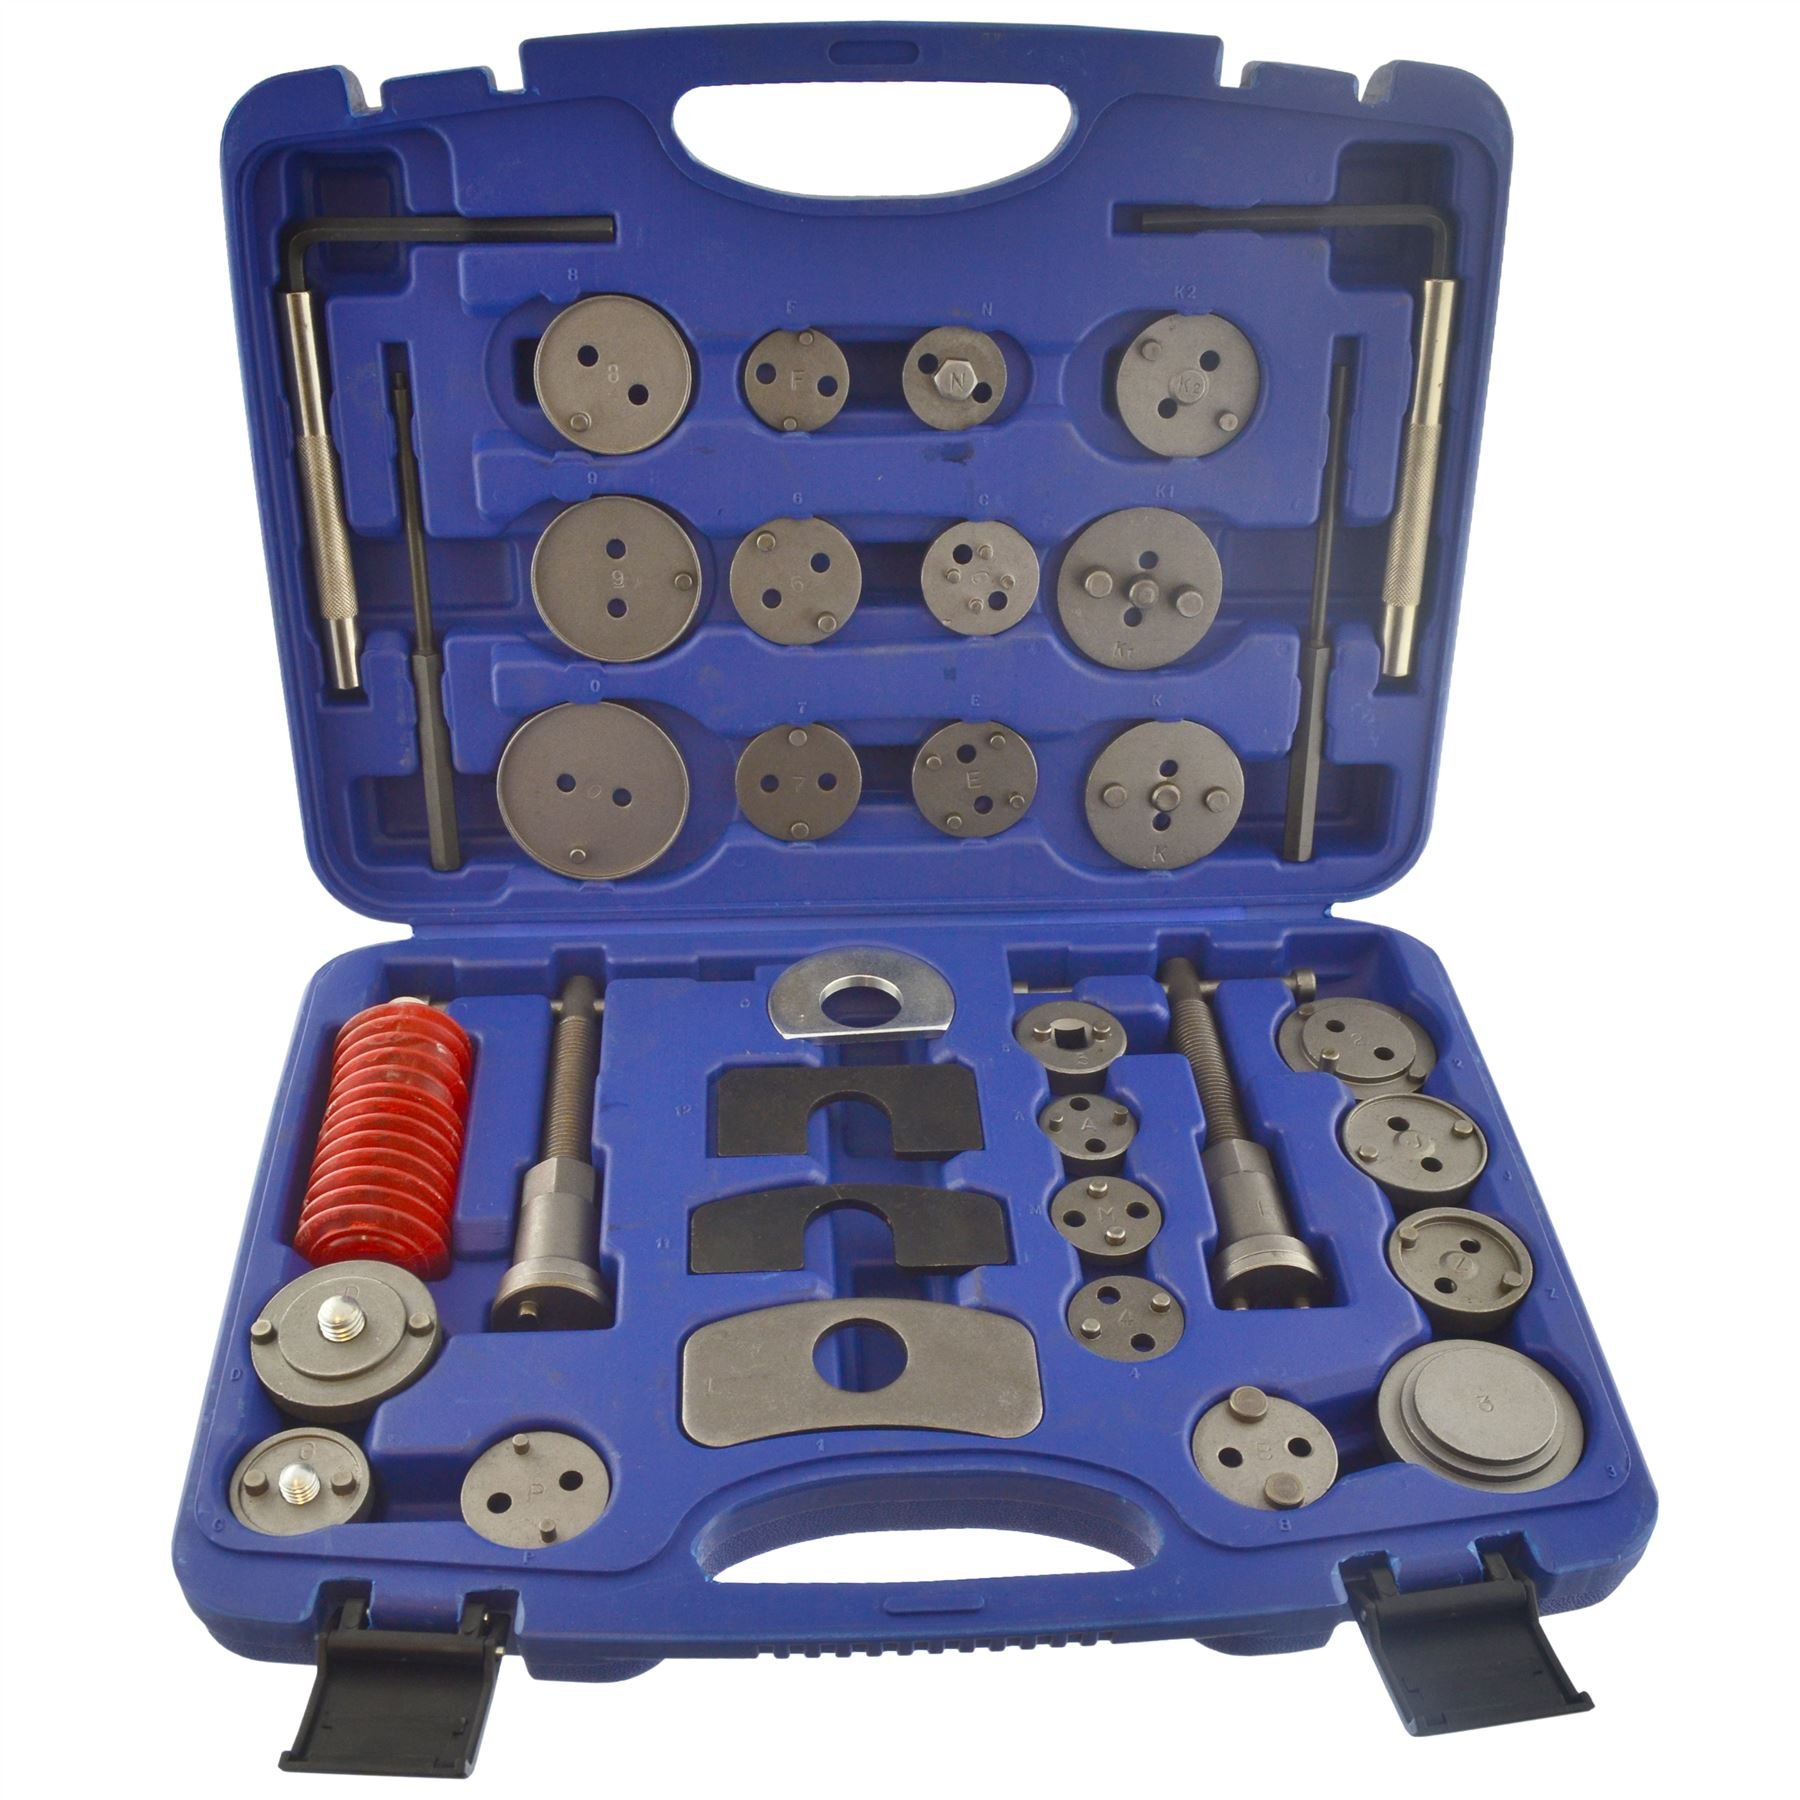 AB Tools-US Pro 35pc Left & Right Hand Brake Calliper/Calliper Wind Back Tool Piston Kit AU003